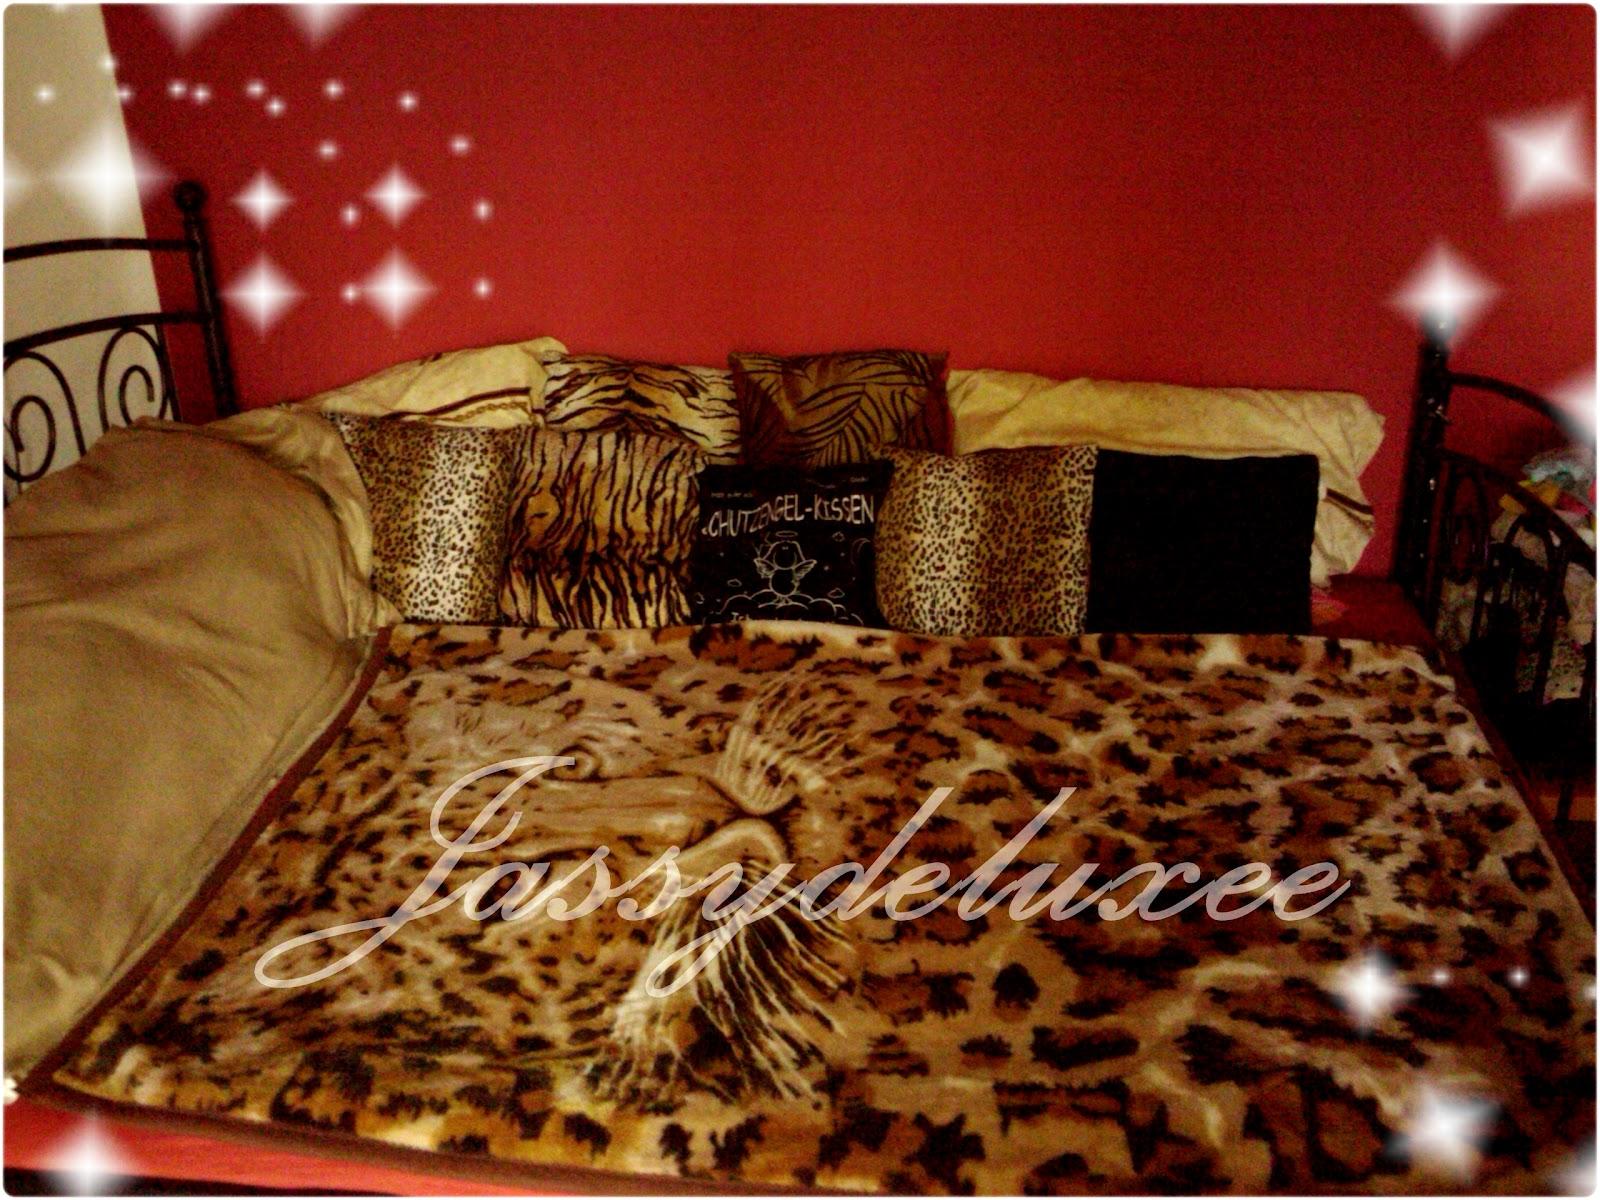 jassydeluxee zimmer aufr umen. Black Bedroom Furniture Sets. Home Design Ideas